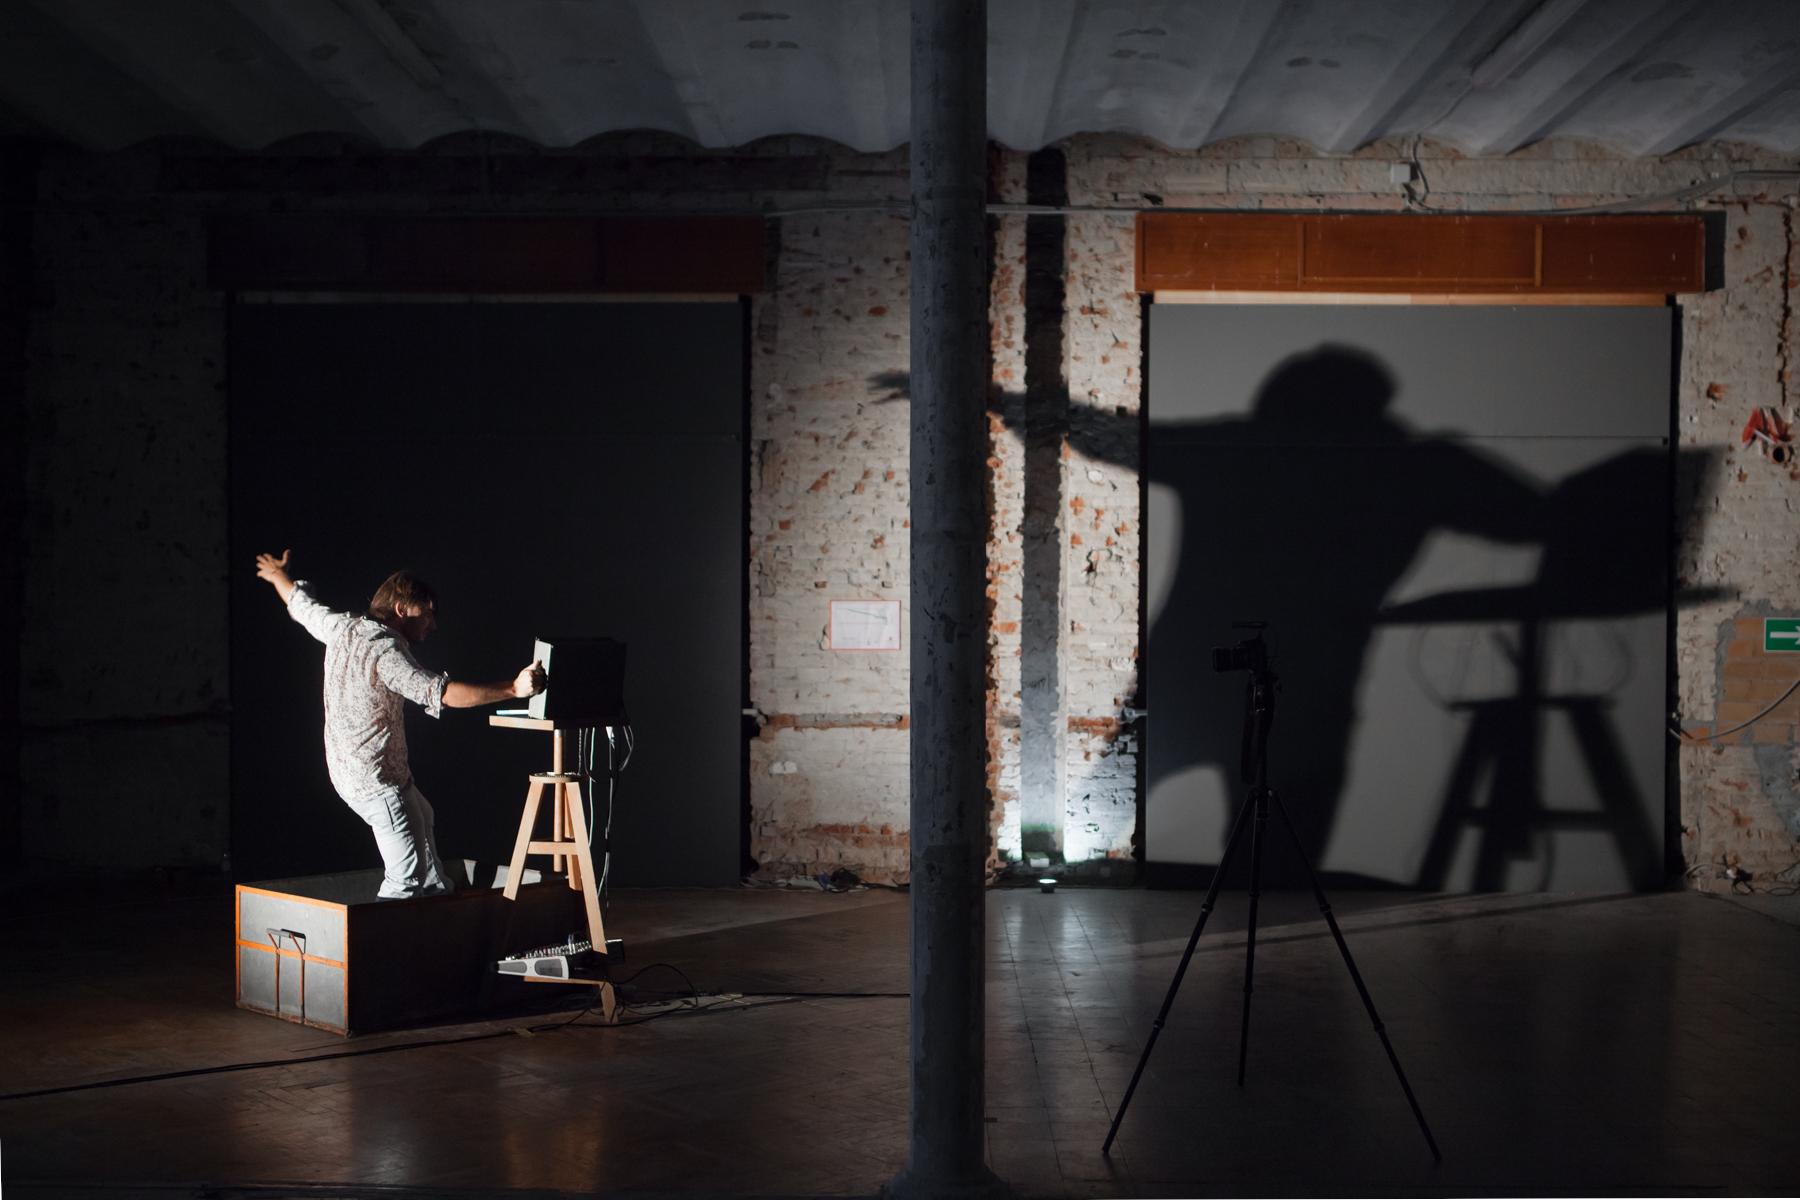 Félix Lachaize, Perf Pad Dance. hand truck sound ride, 2016, performance, Livenel performingartsfestival, Piacenza, fotografia Daniele Signaroldi_2